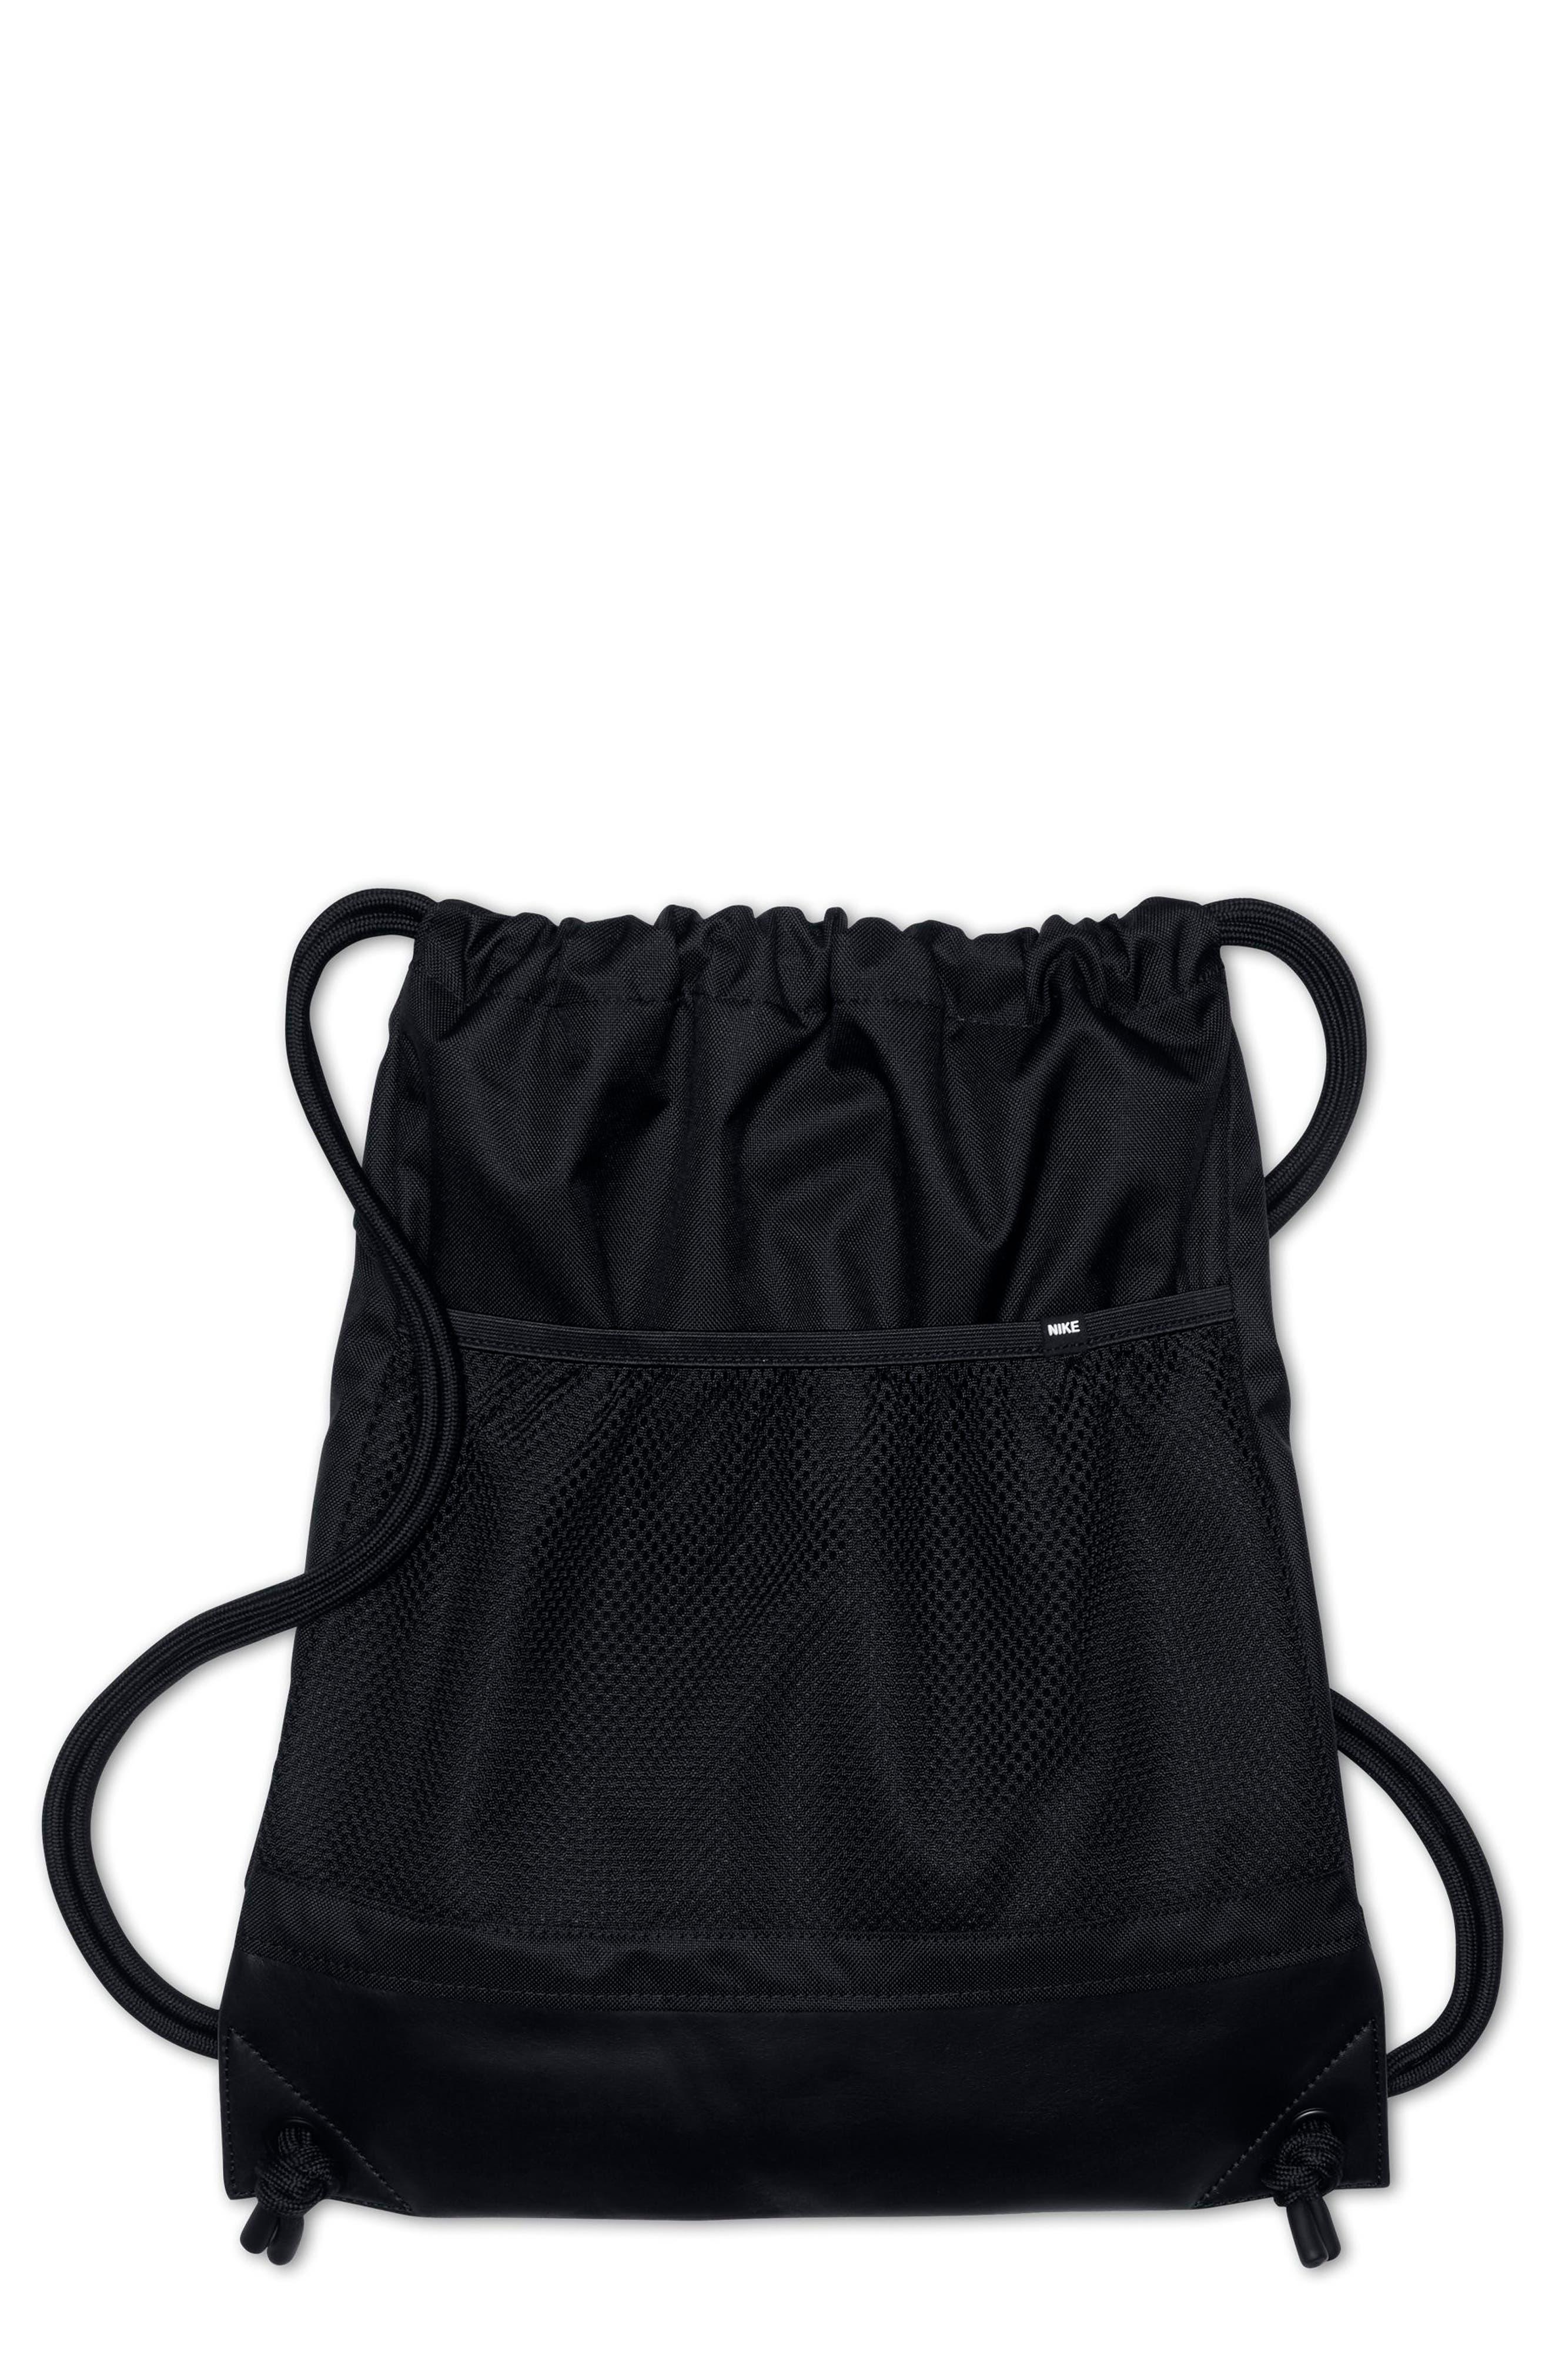 NikeLab Gym Sack,                             Main thumbnail 1, color,                             BLACK/ BLACK/ BLACK